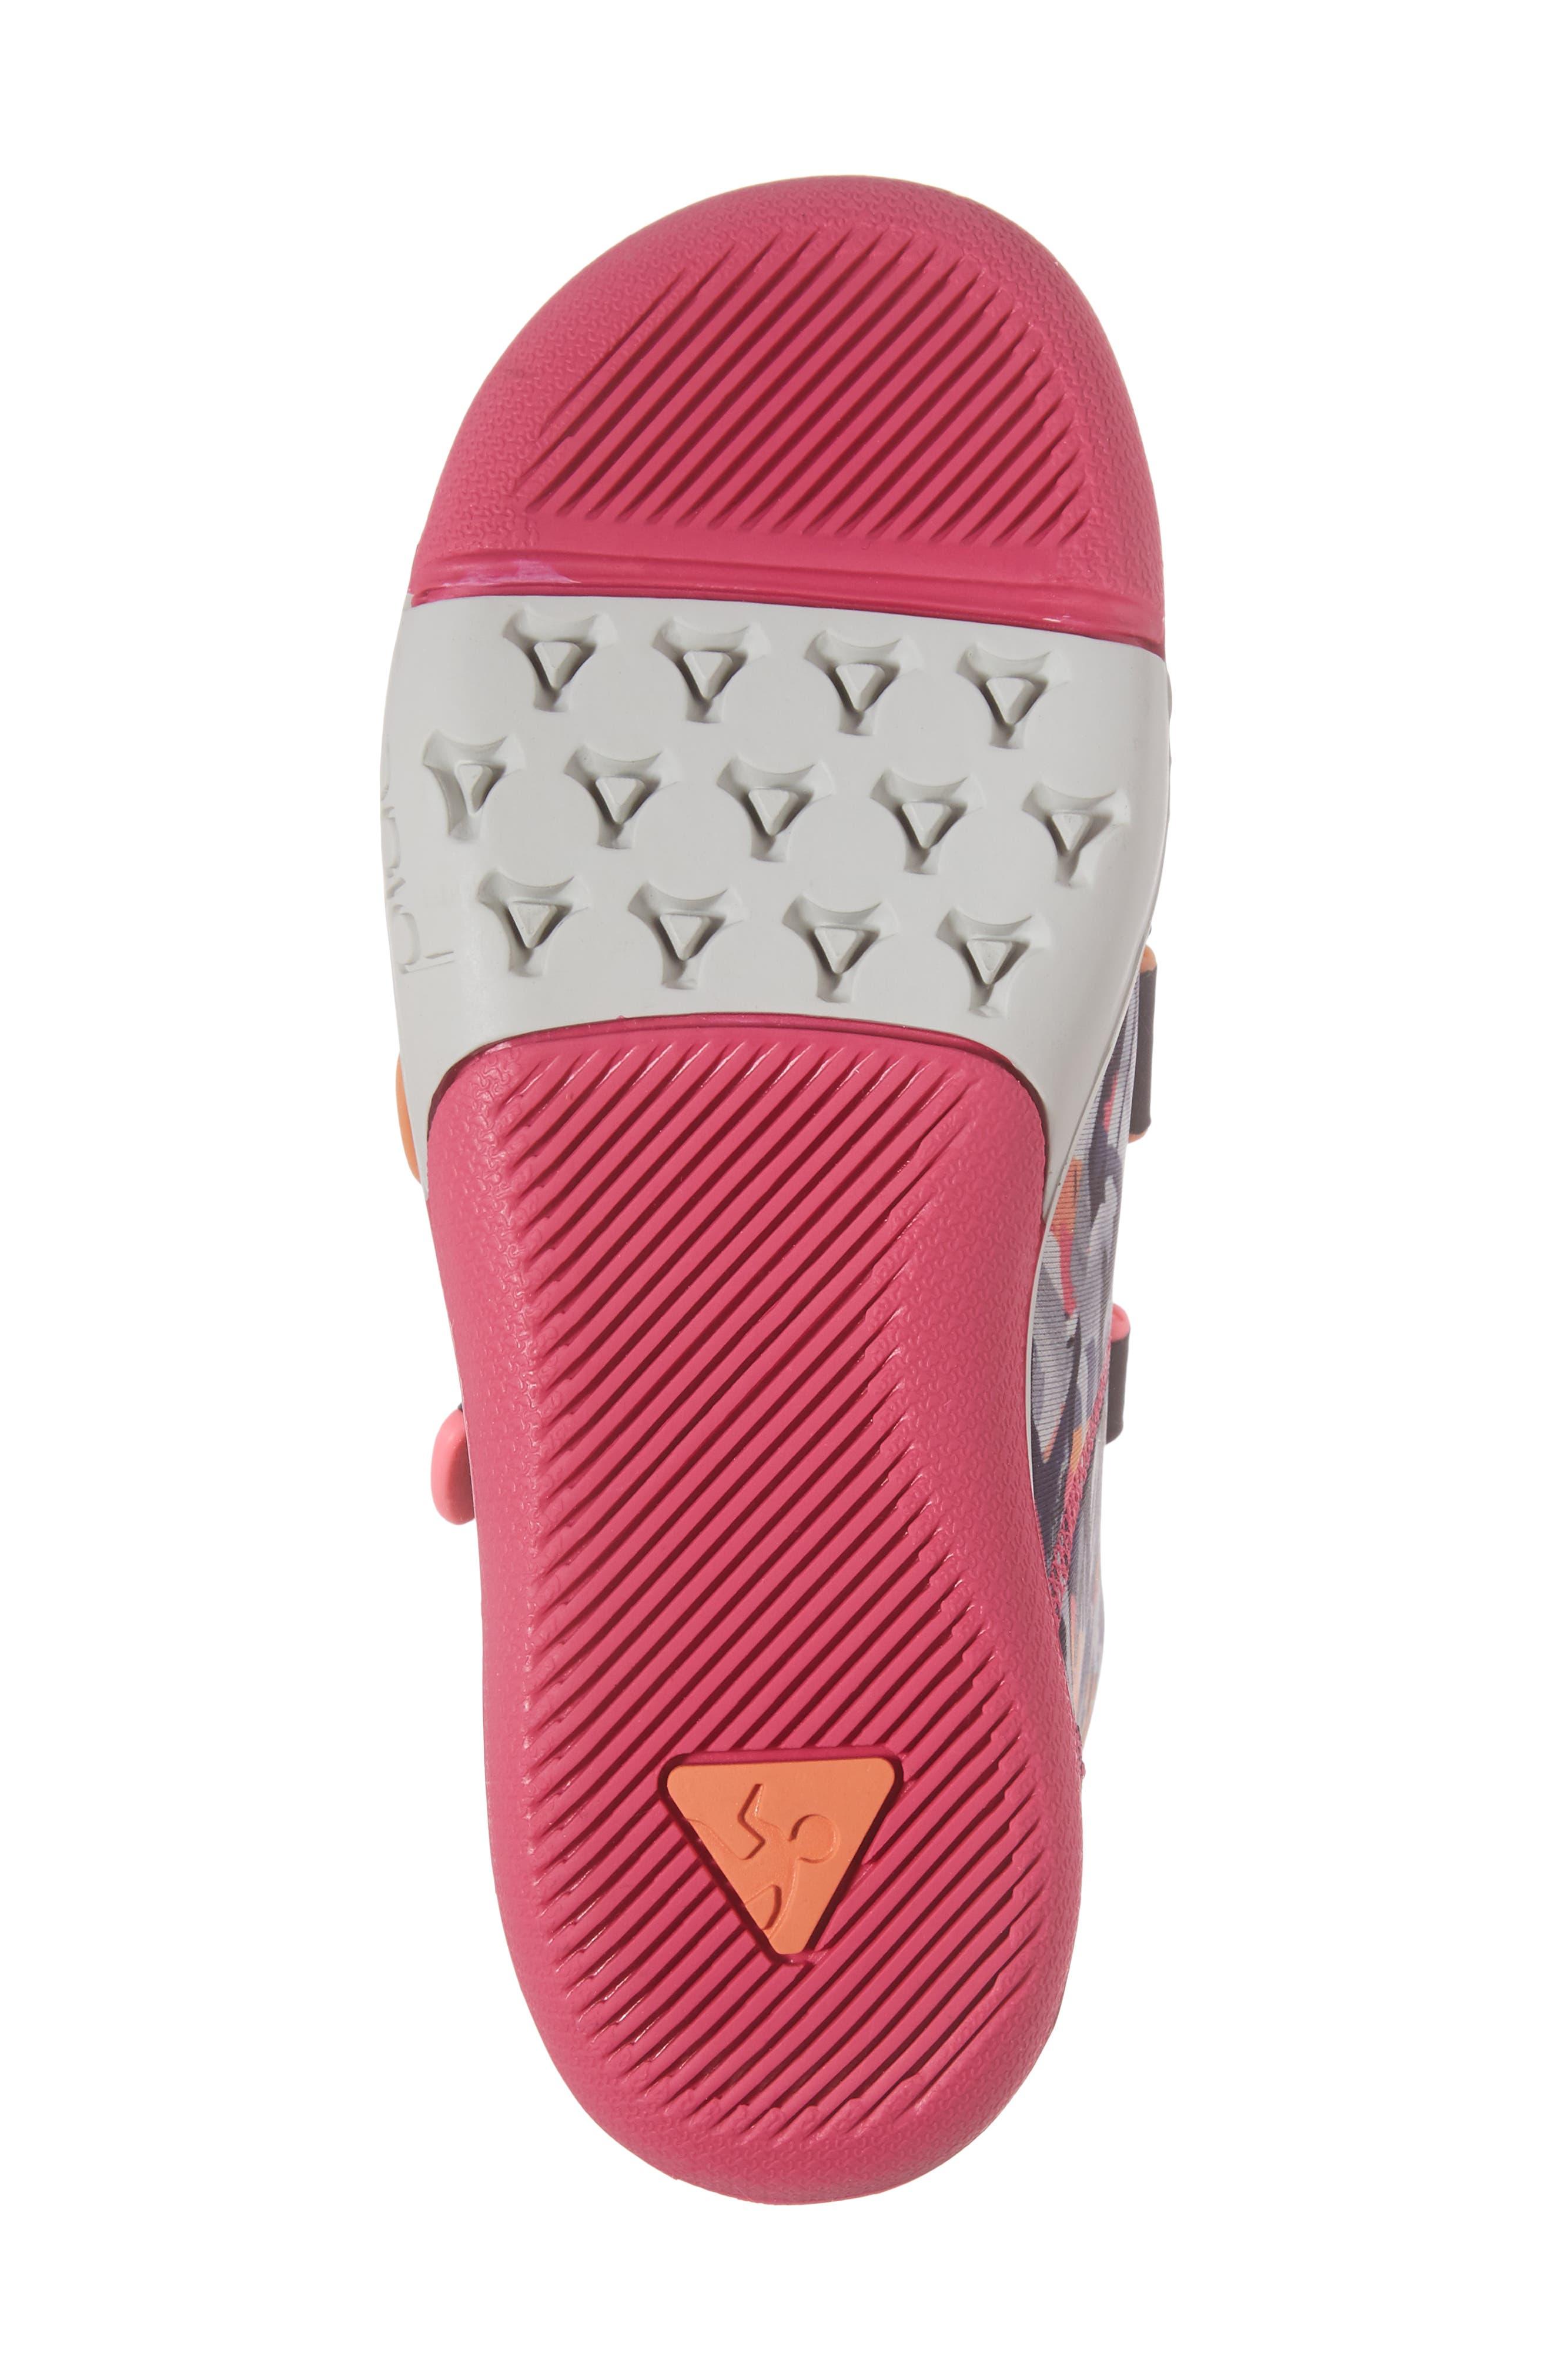 Max Customizable Mid Top Sneaker,                             Alternate thumbnail 6, color,                             503